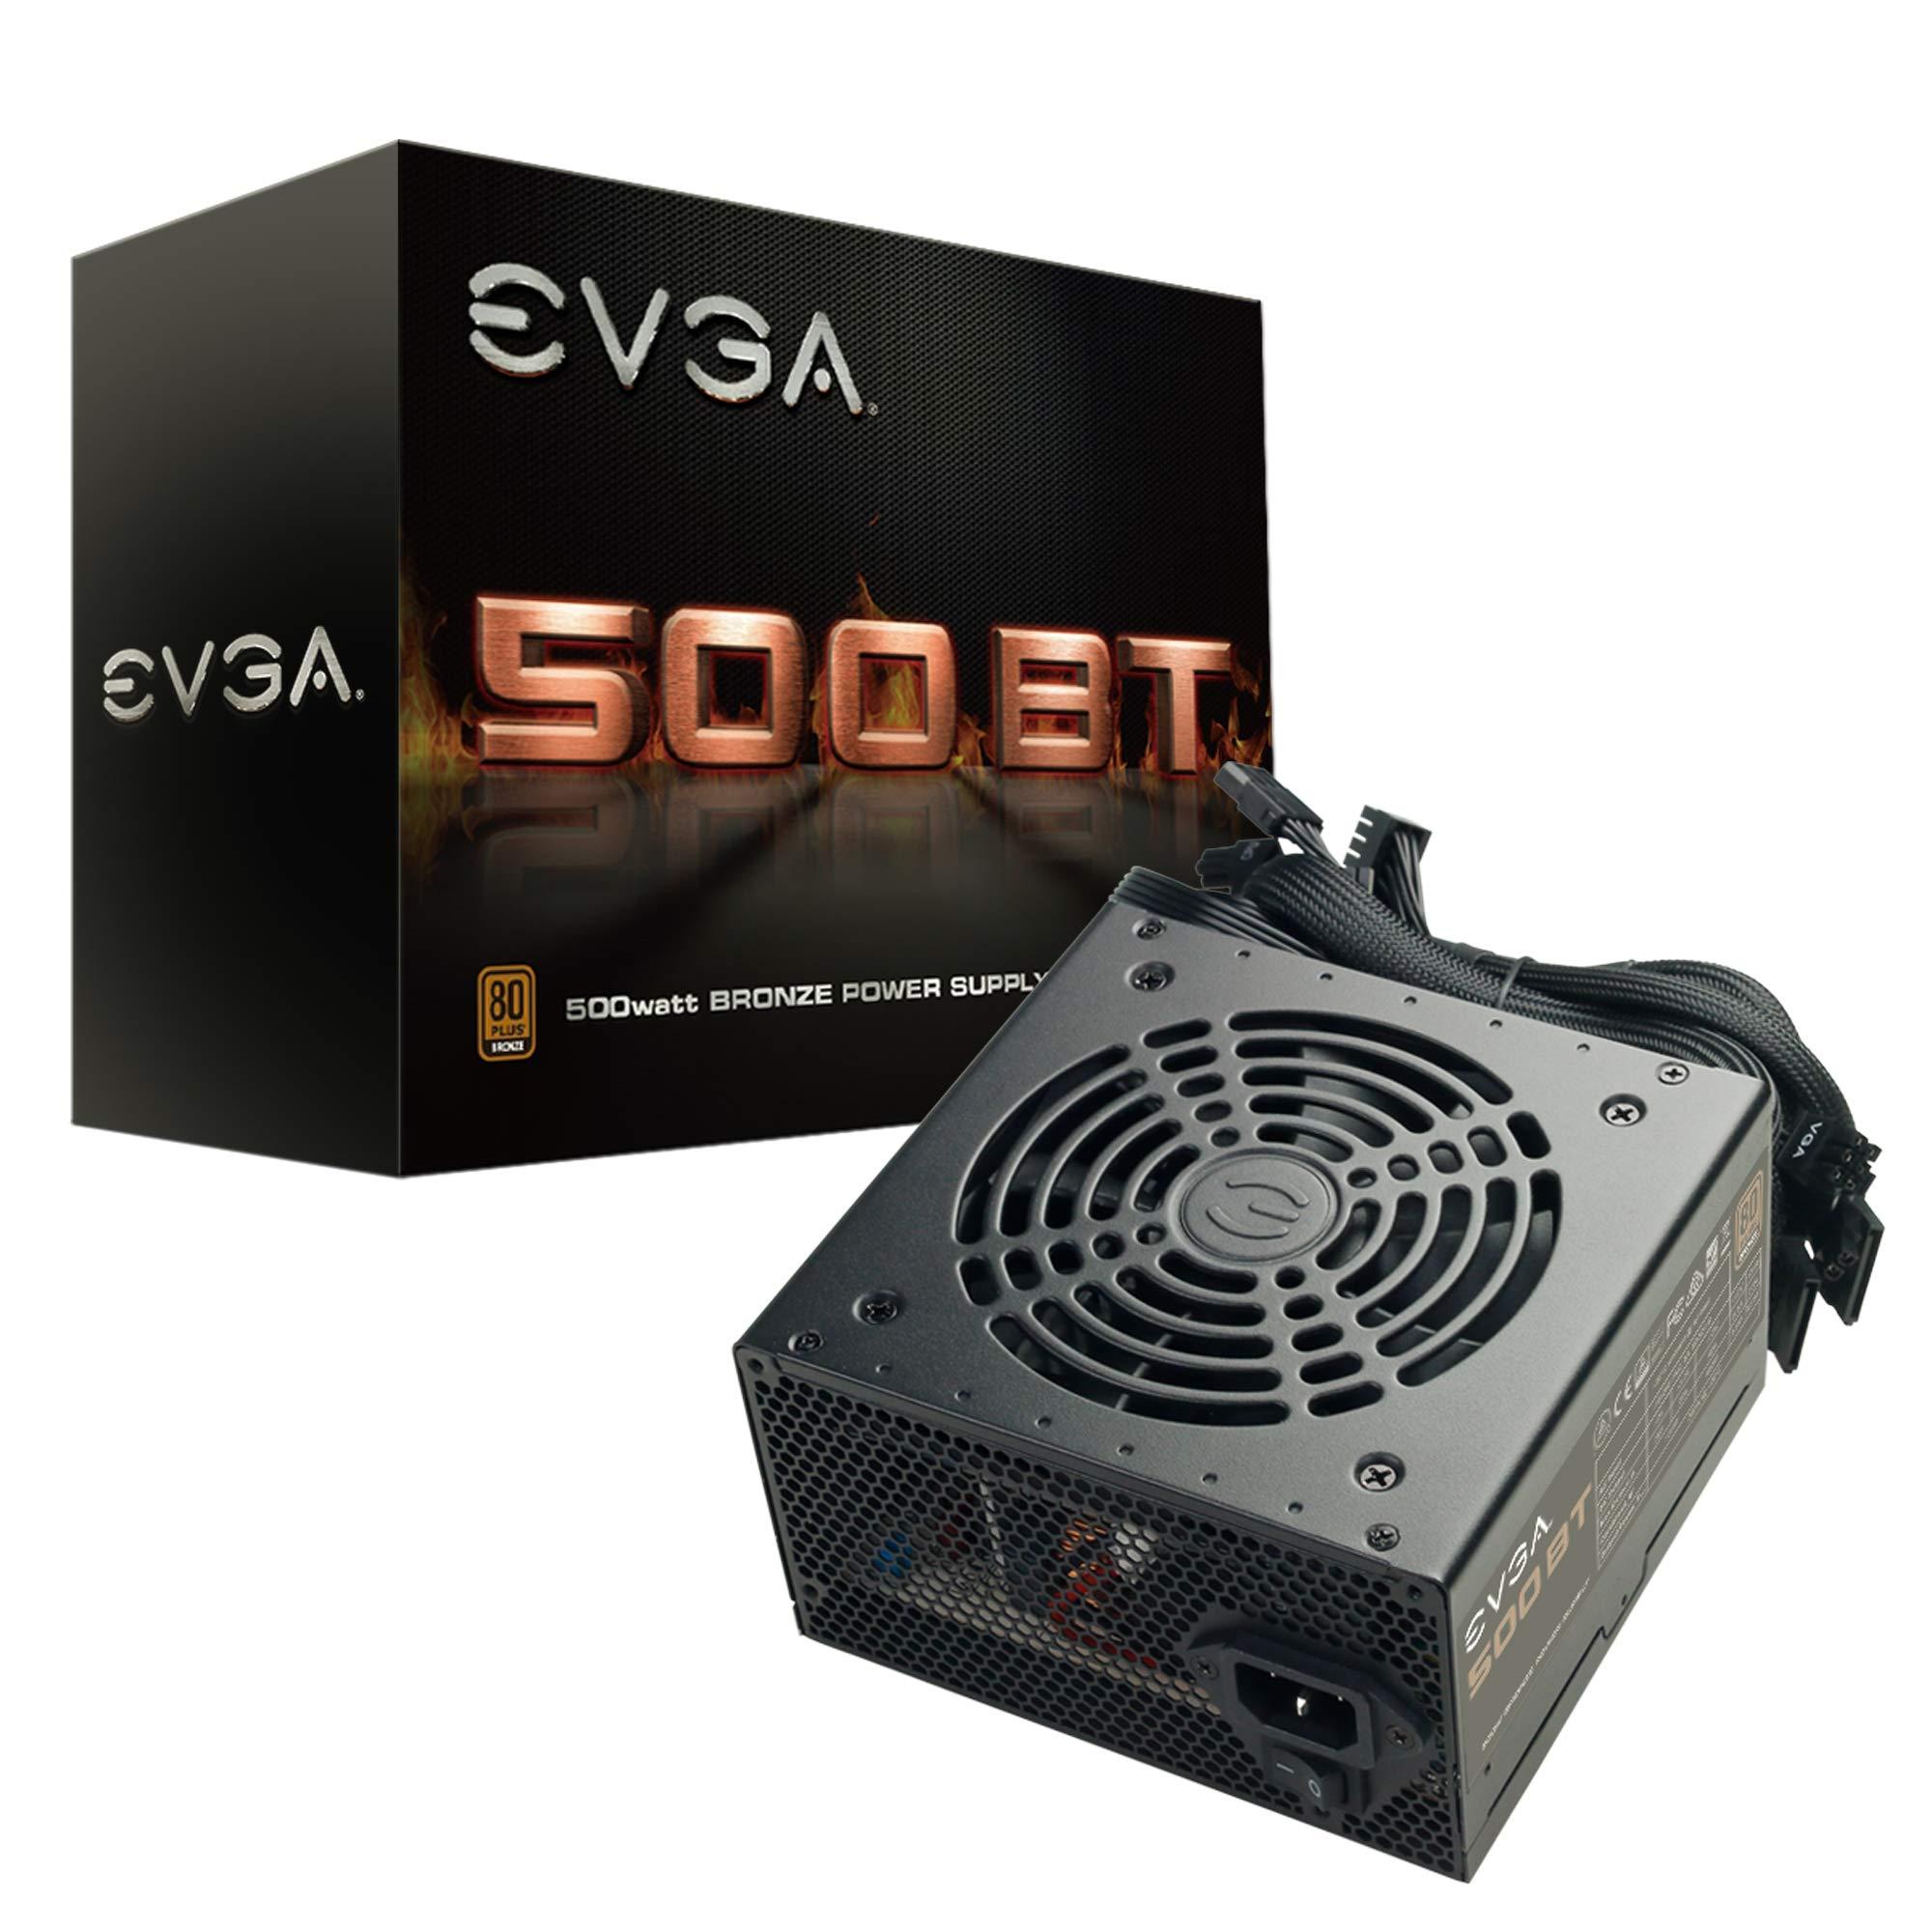 EVGA 500 BT, 80+ Bronze, 500W, 3 Year Warranty, Power Supply 100-BT-0500-K1 by EVGA